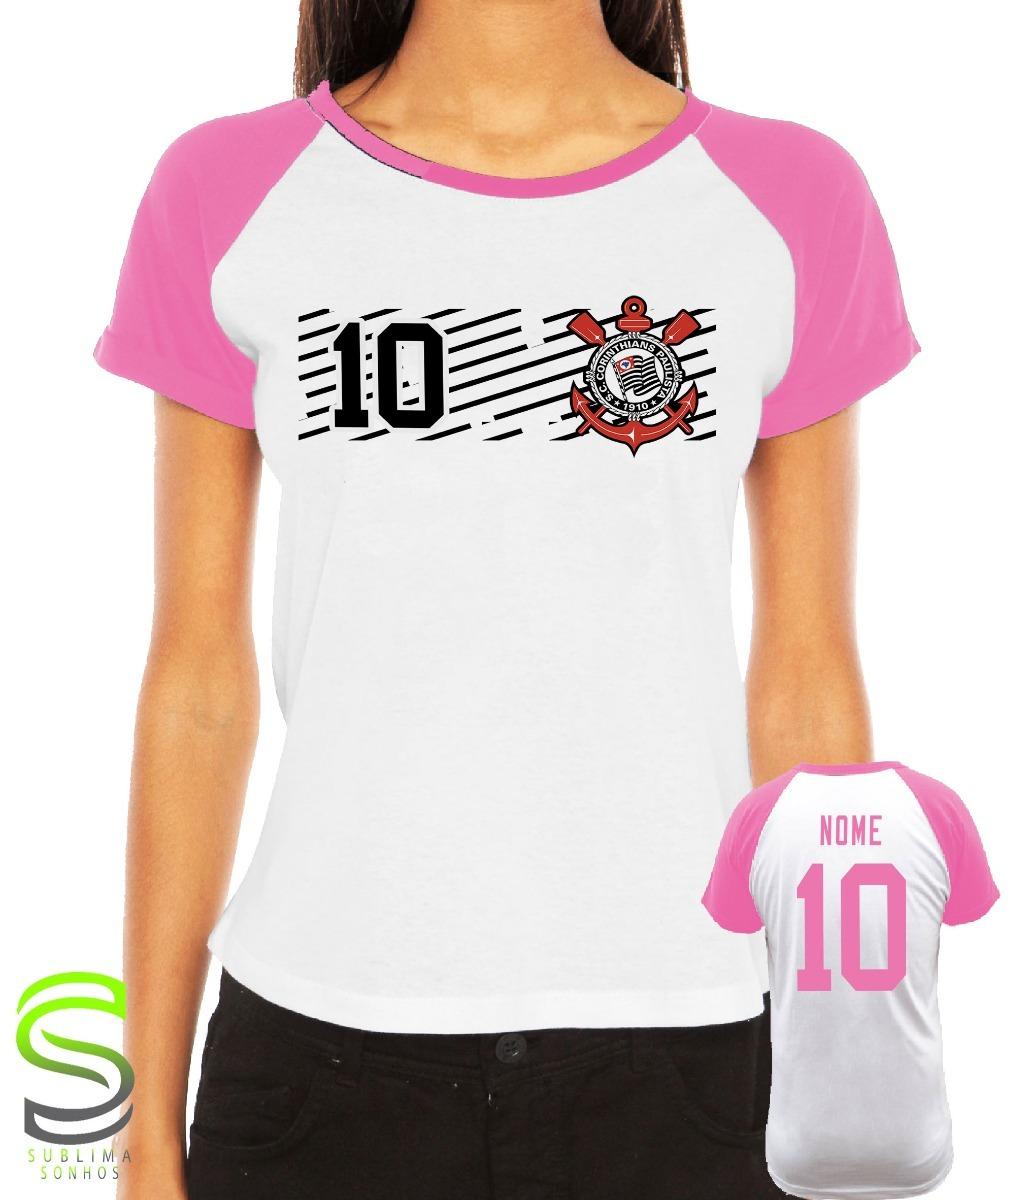 camiseta corinthians feminina personalizada rosa. Carregando zoom. 8cfd64999b01e